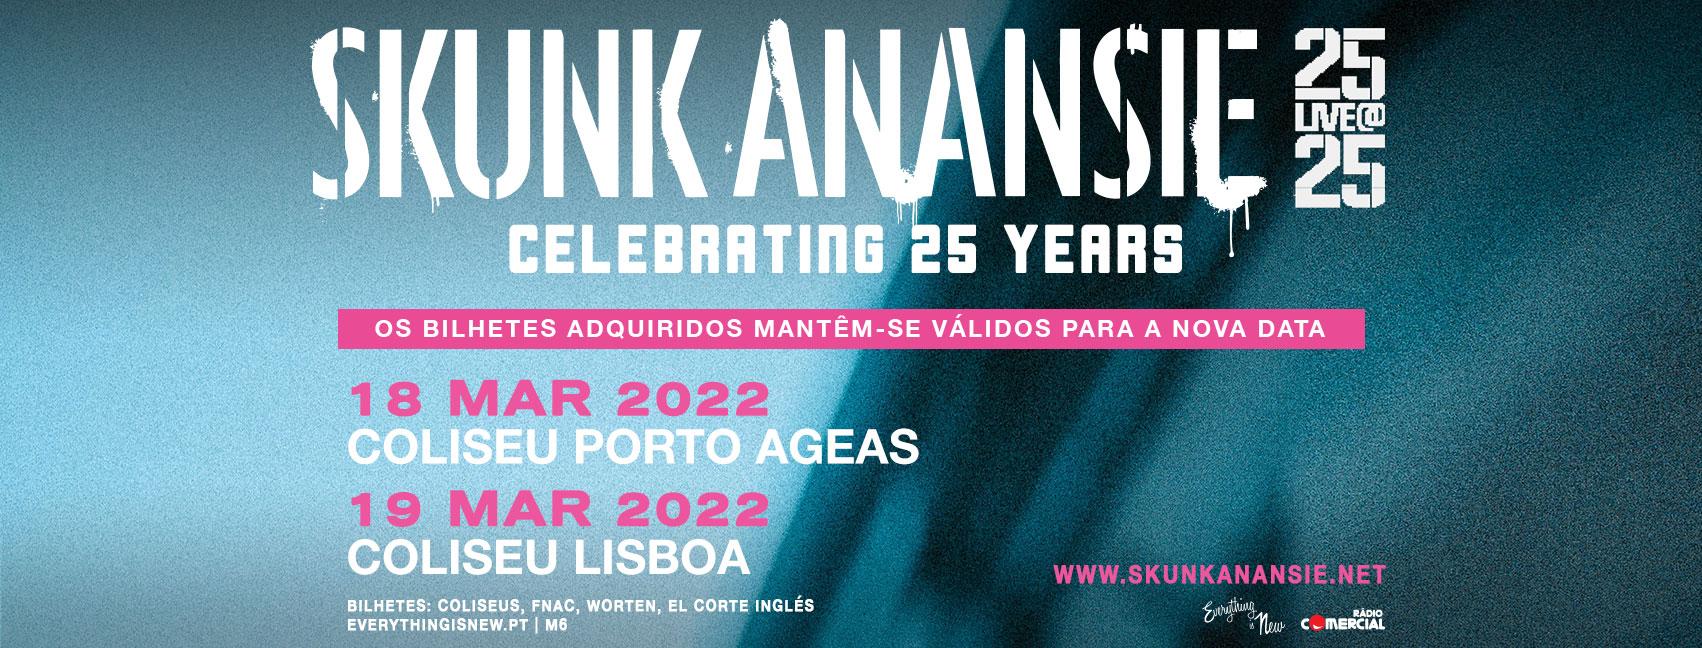 Nova Data: Skunk Anansie // Coliseu Porto Ageas